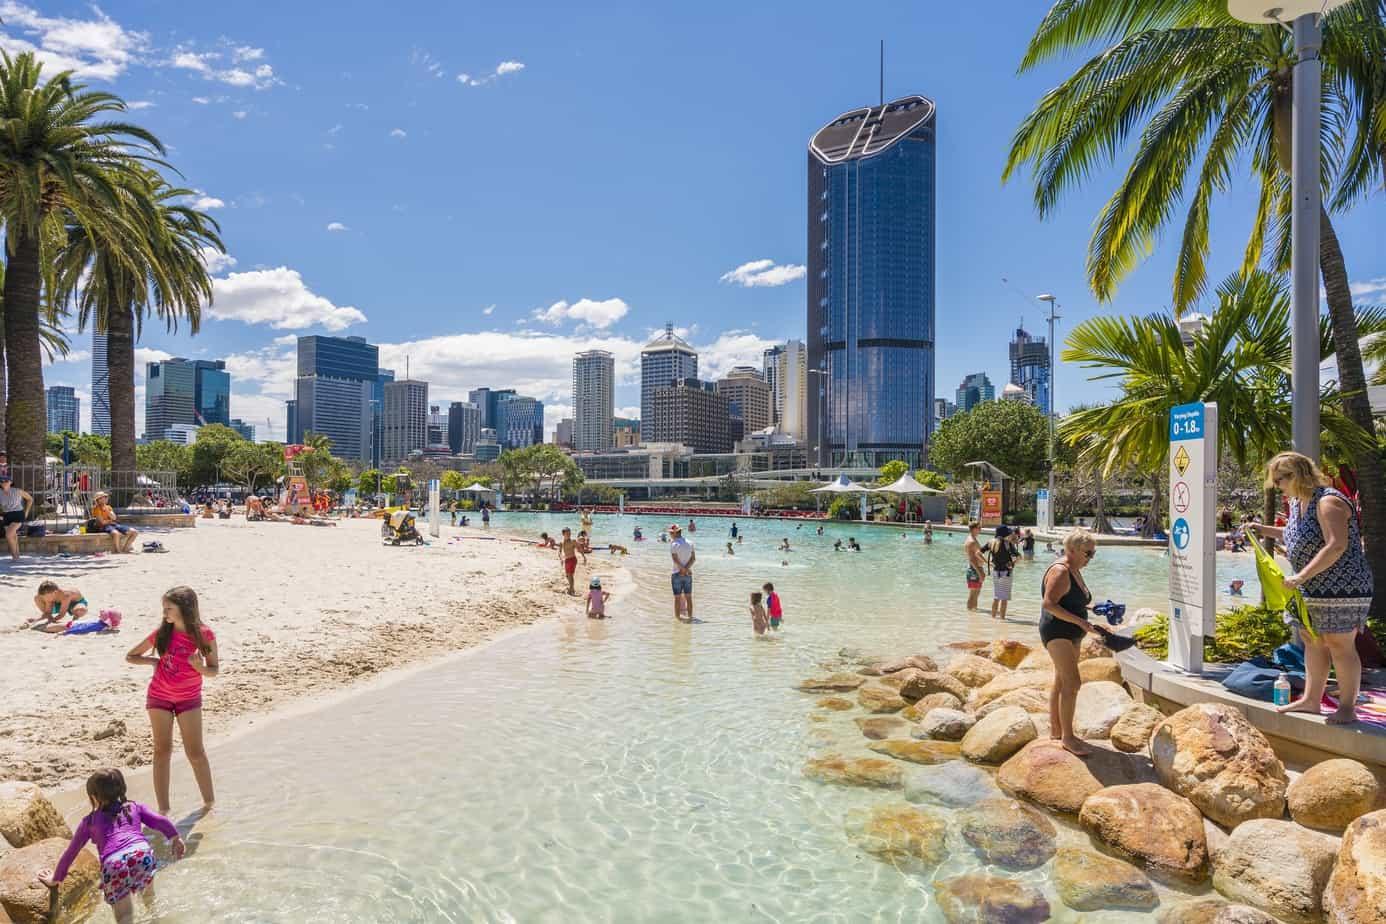 Queensland State Visa Sponsorship Re-Opens!